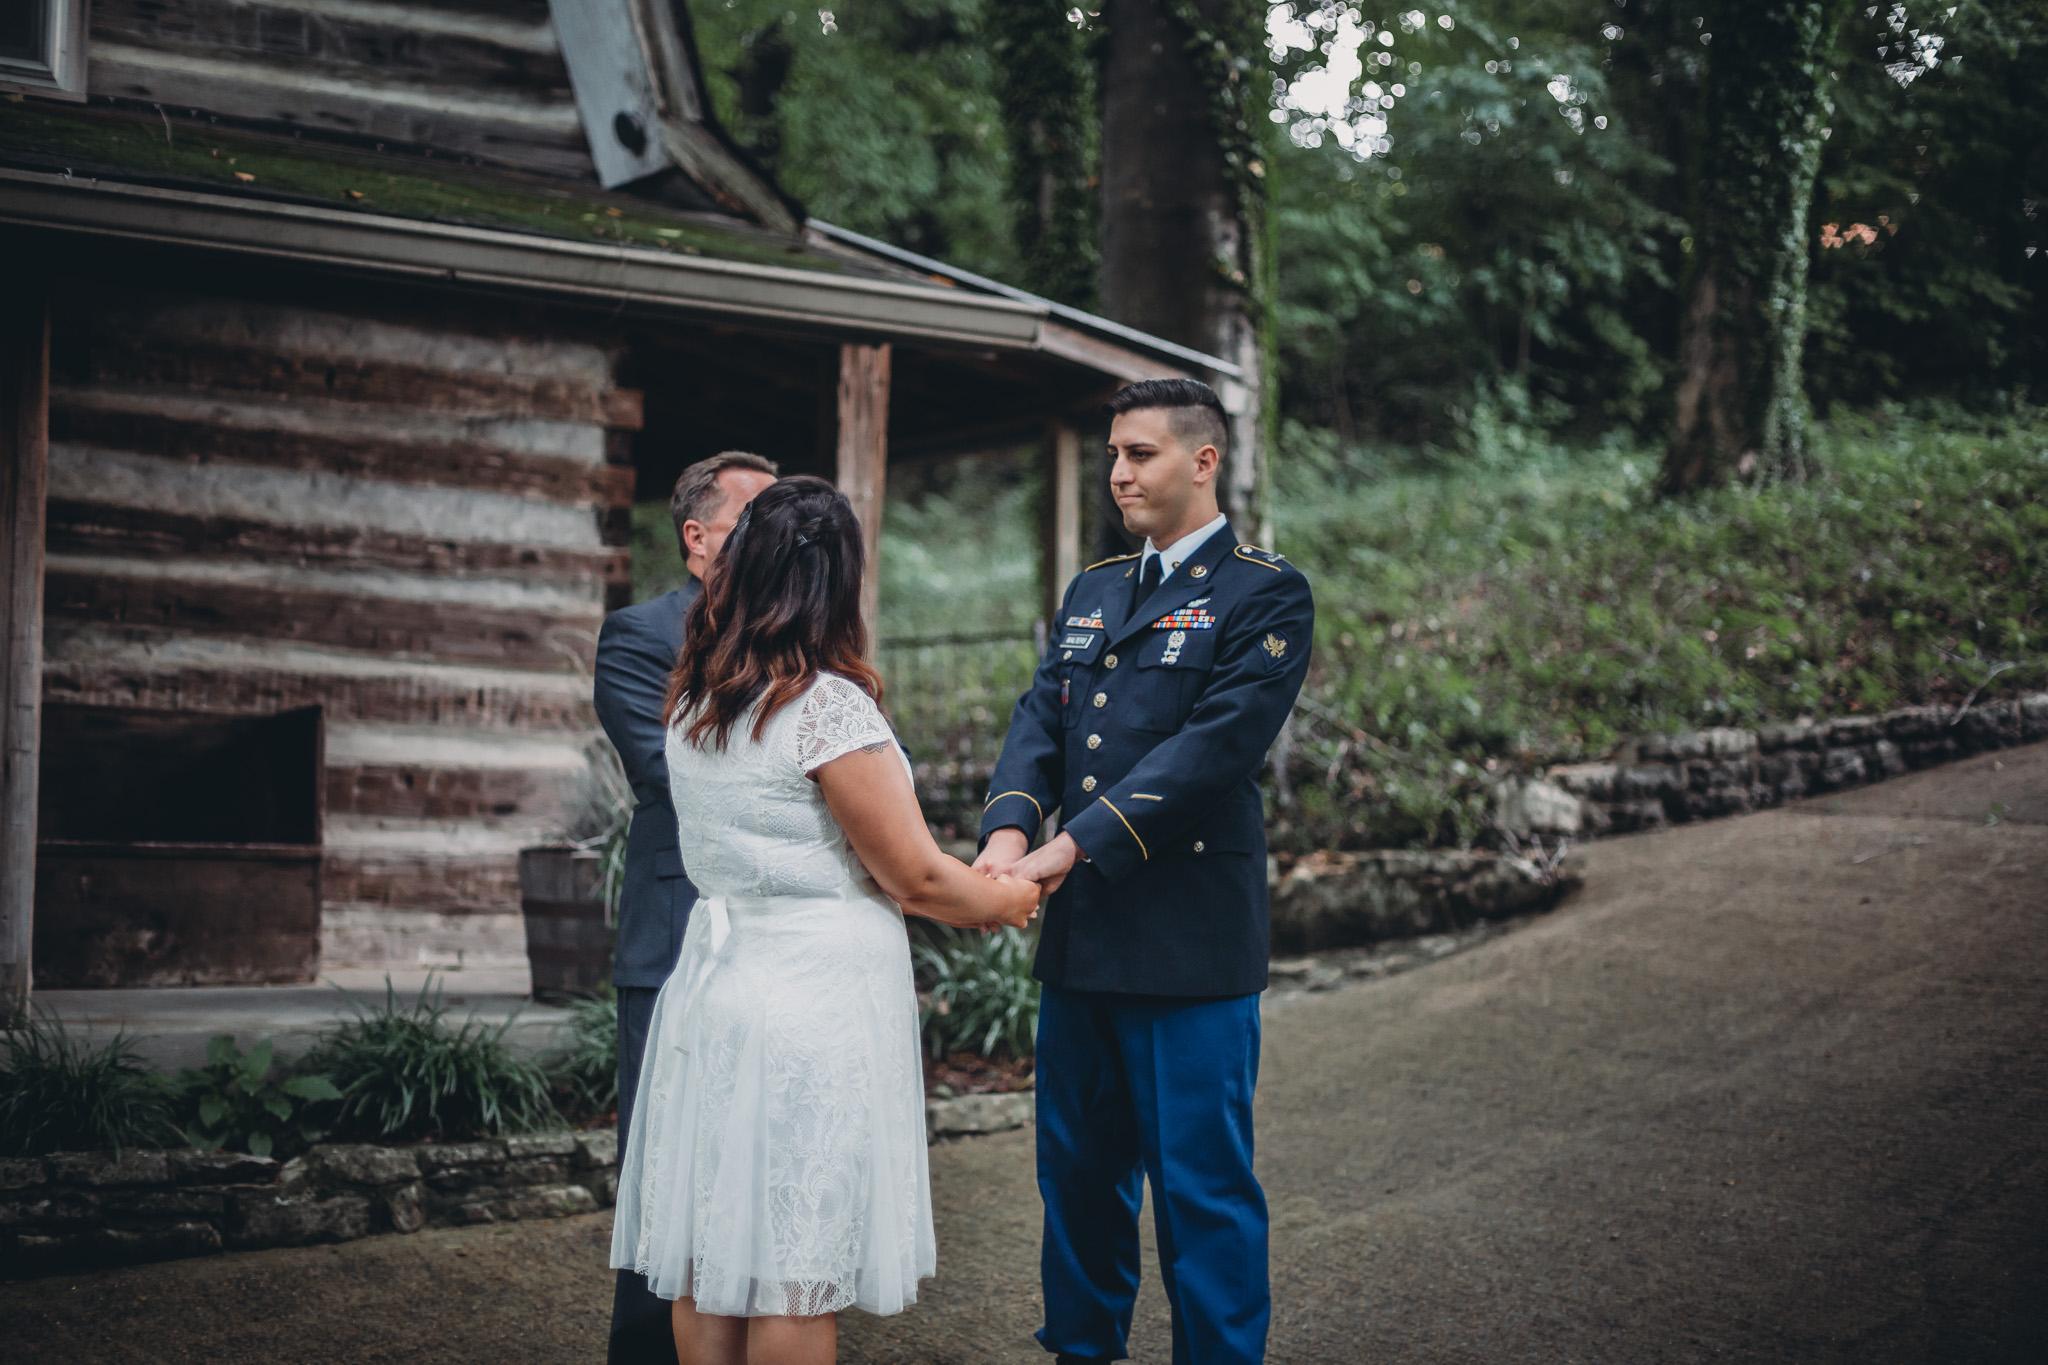 elopement ceremony clarksville tn